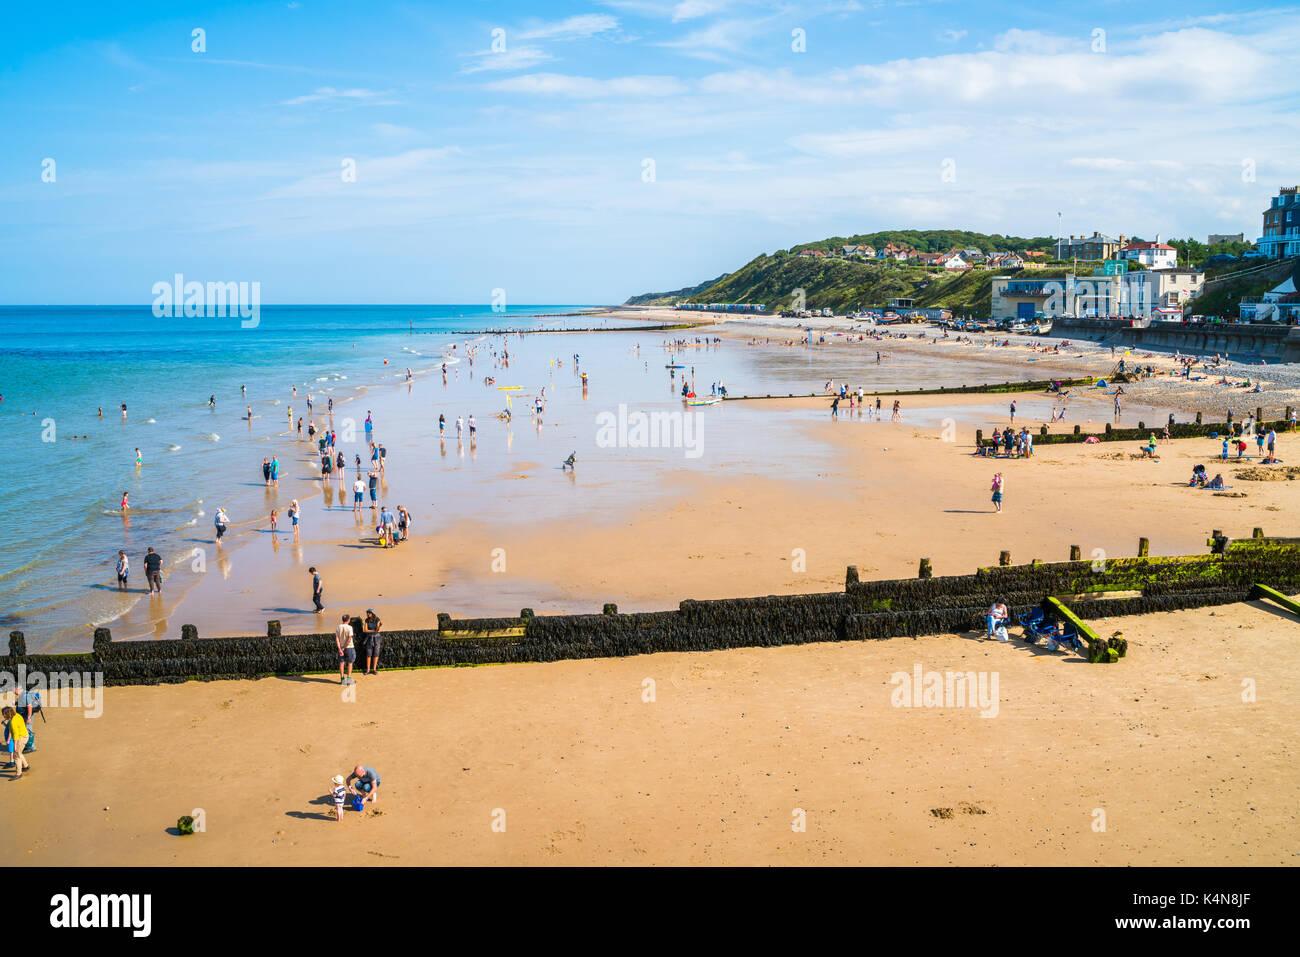 HUNSTANTON, NORFOLK, UK - AUGUST 26 2017: View of the beach in Hunstanton, Norfolk. Tourists and locals enjoy beautiful, - Stock Photo